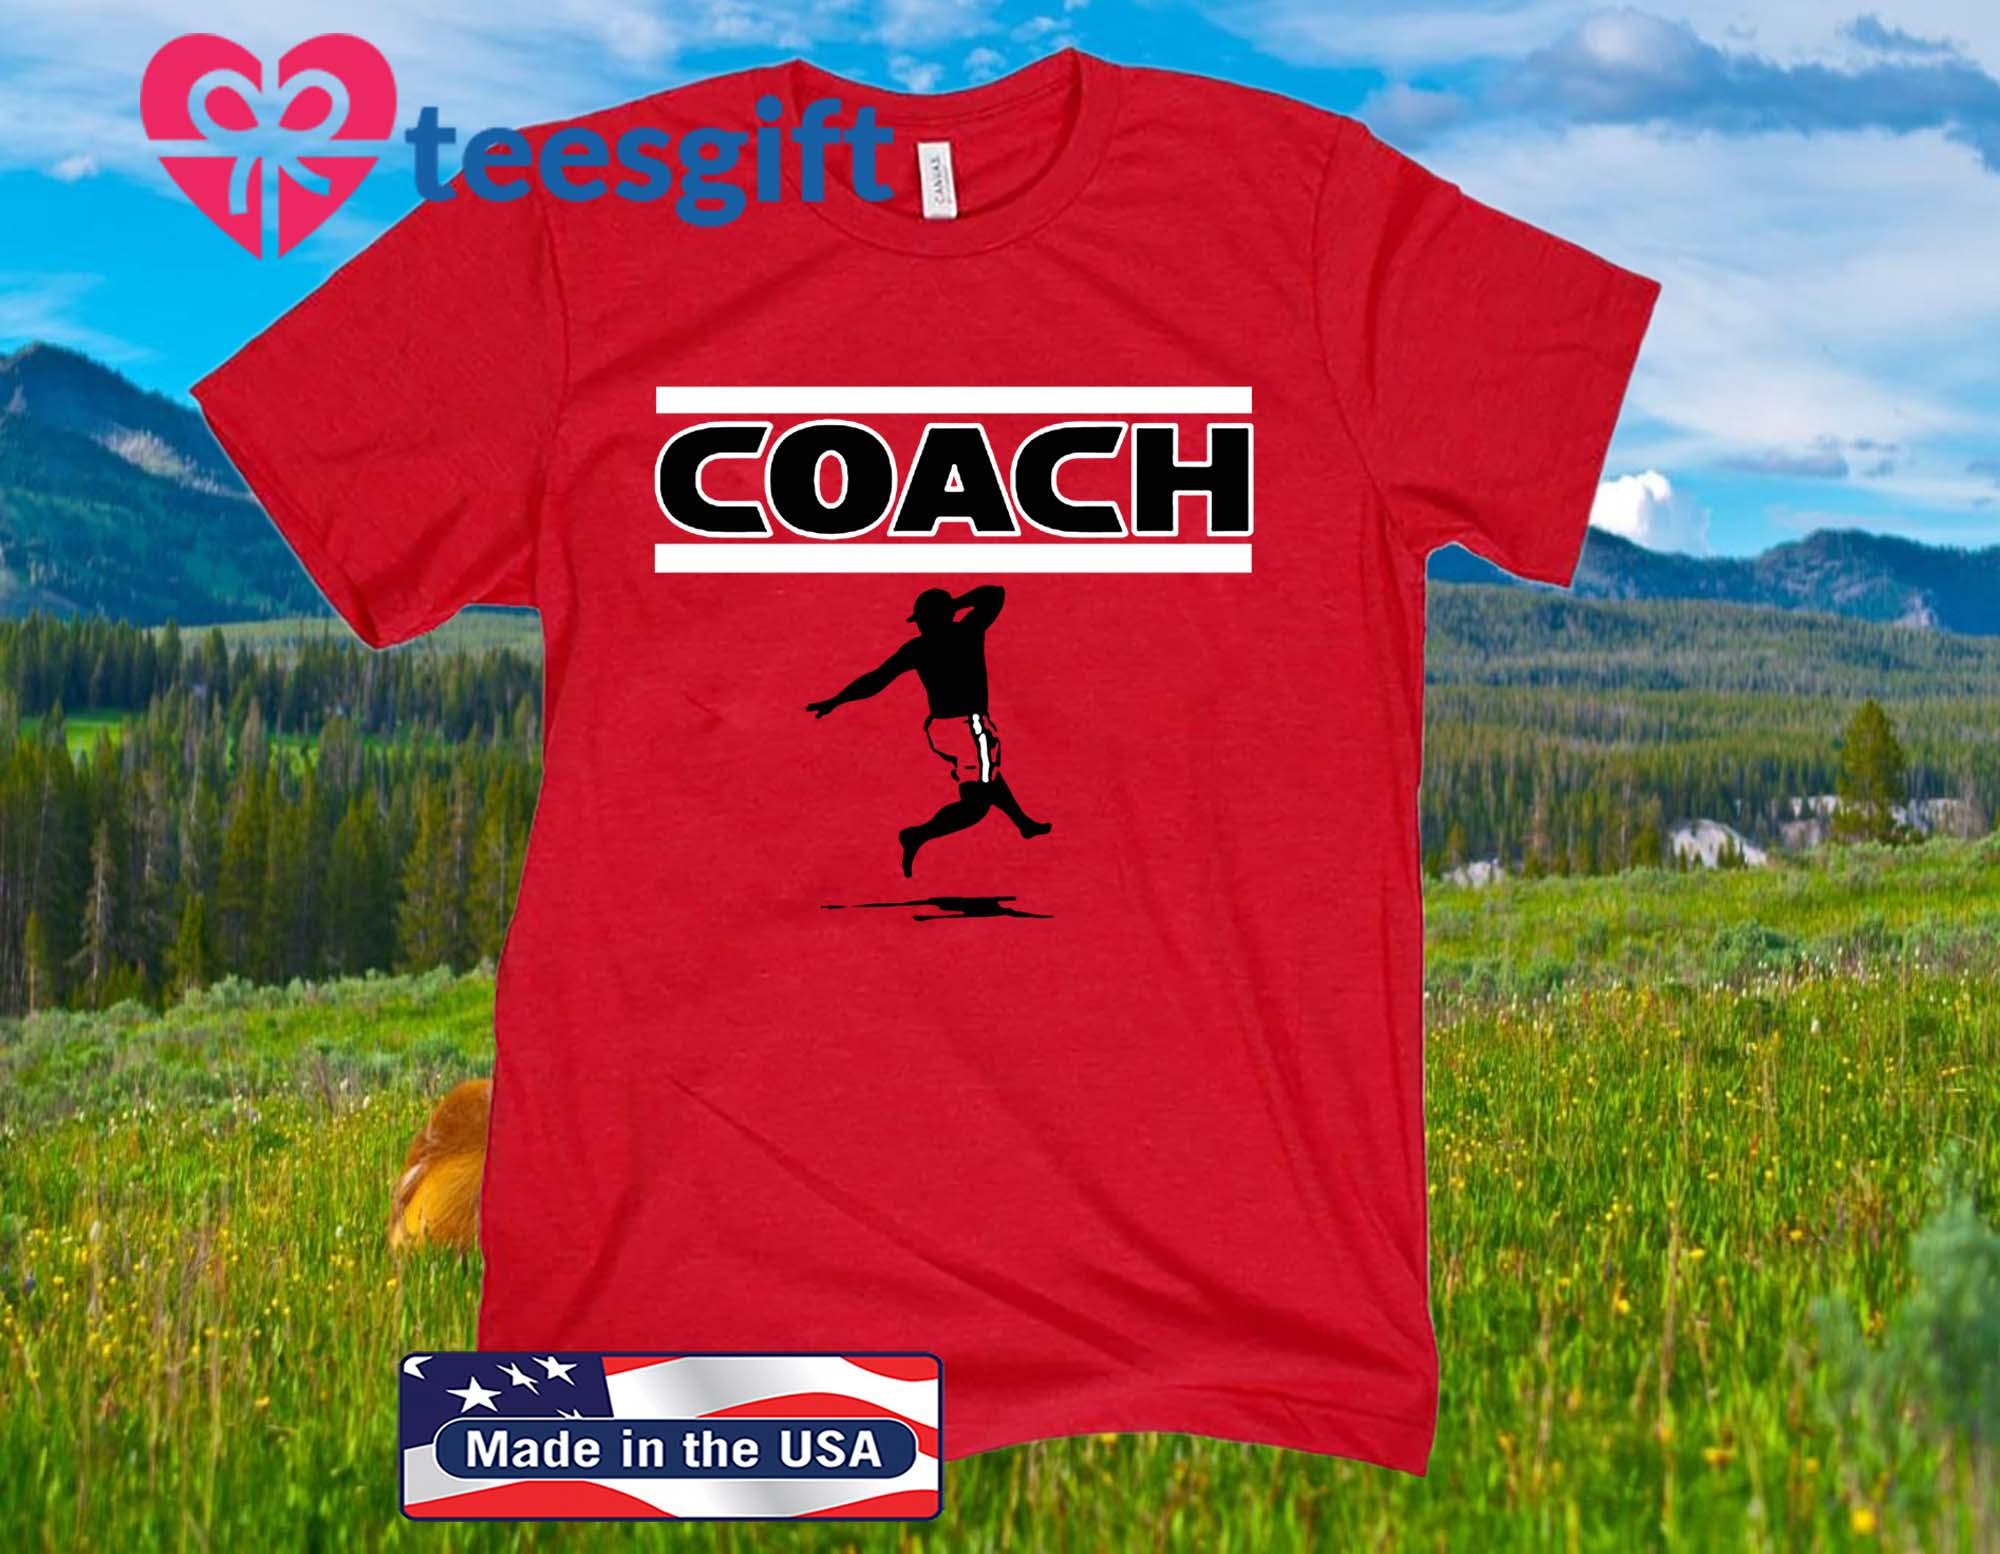 High Steppin' Coach 2020 Shirt, Athens, Ga Football